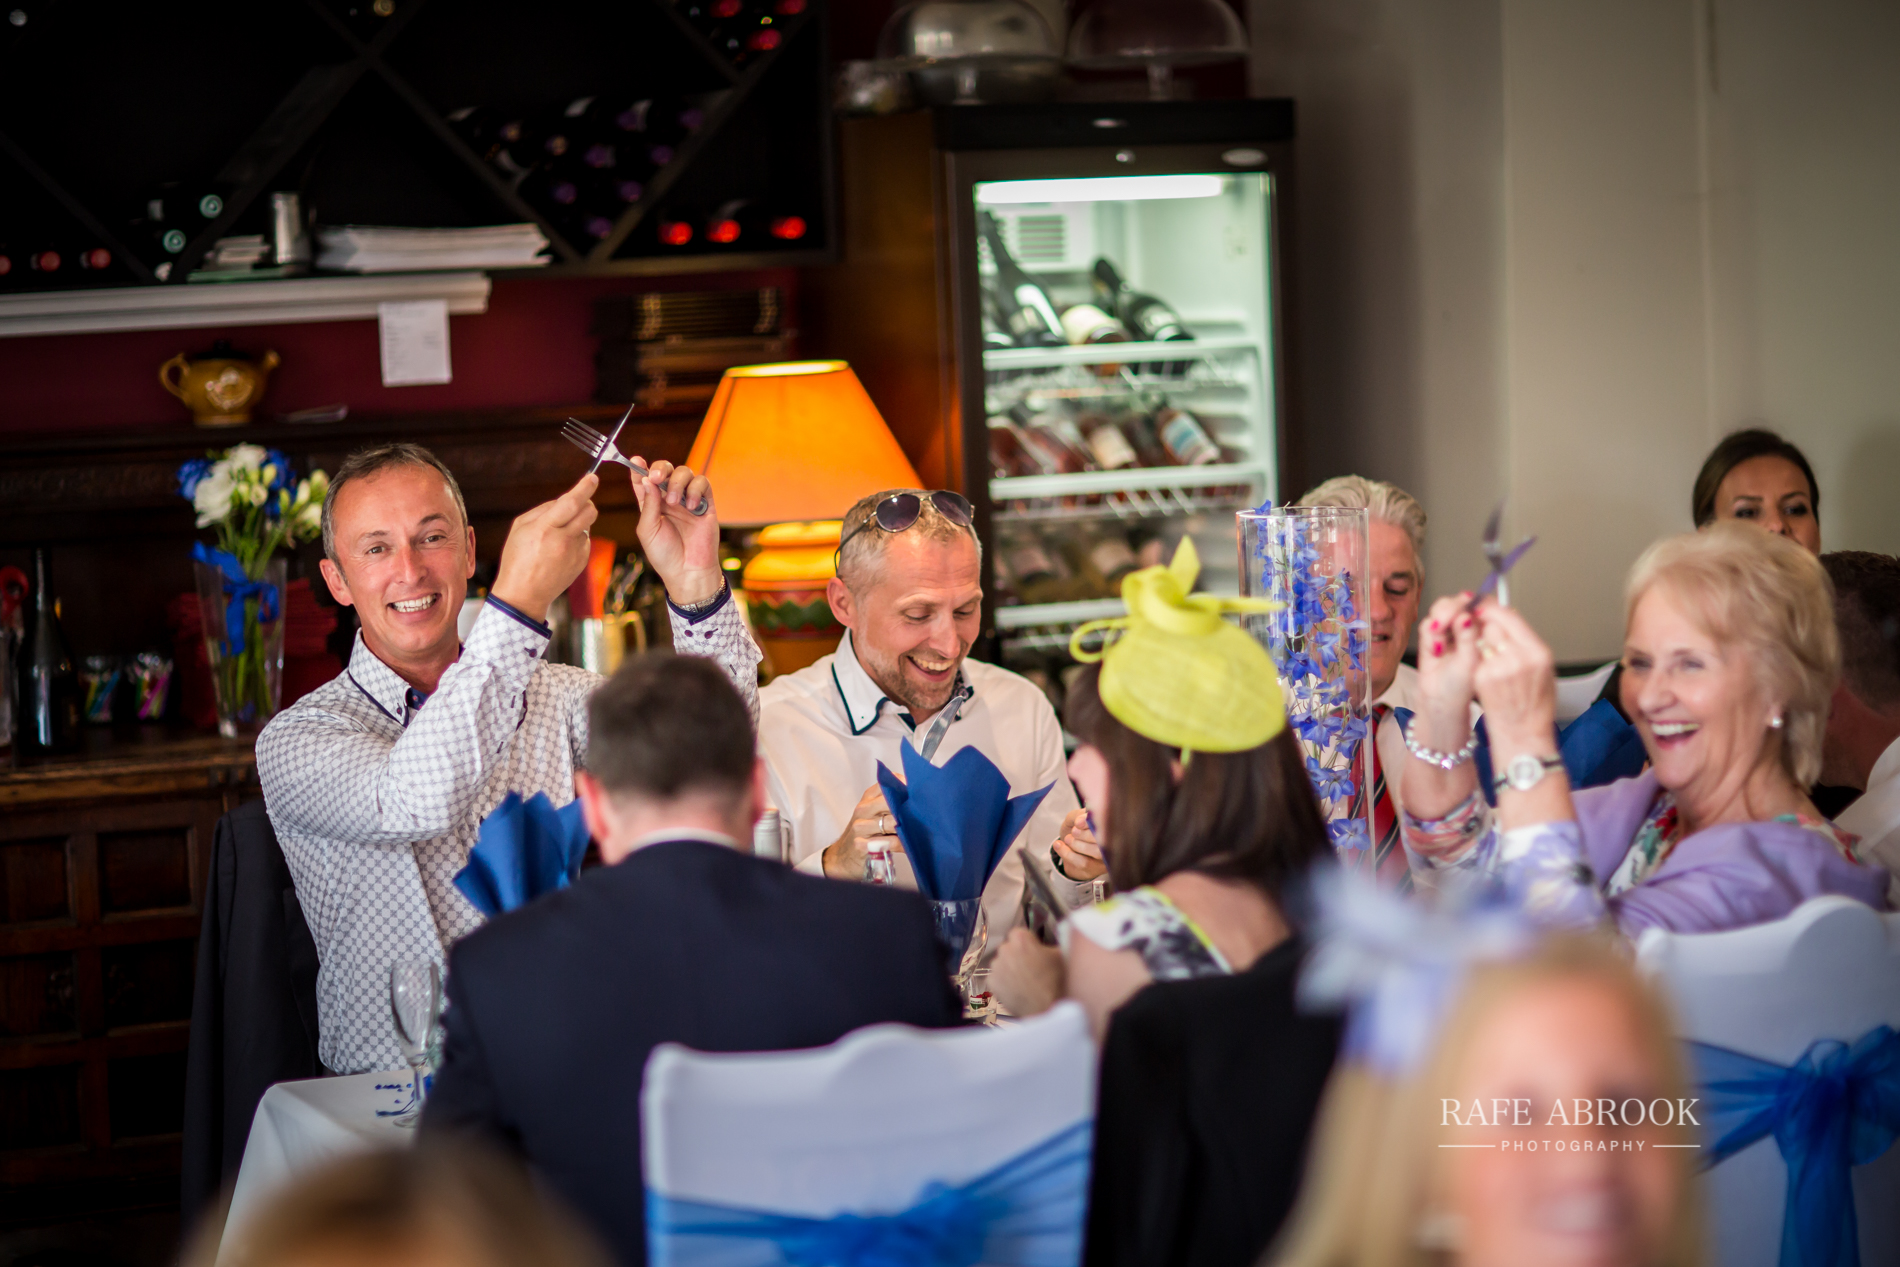 agnes & laurence wedding kings lodge hotel kings langley hertfordshire-1252.jpg